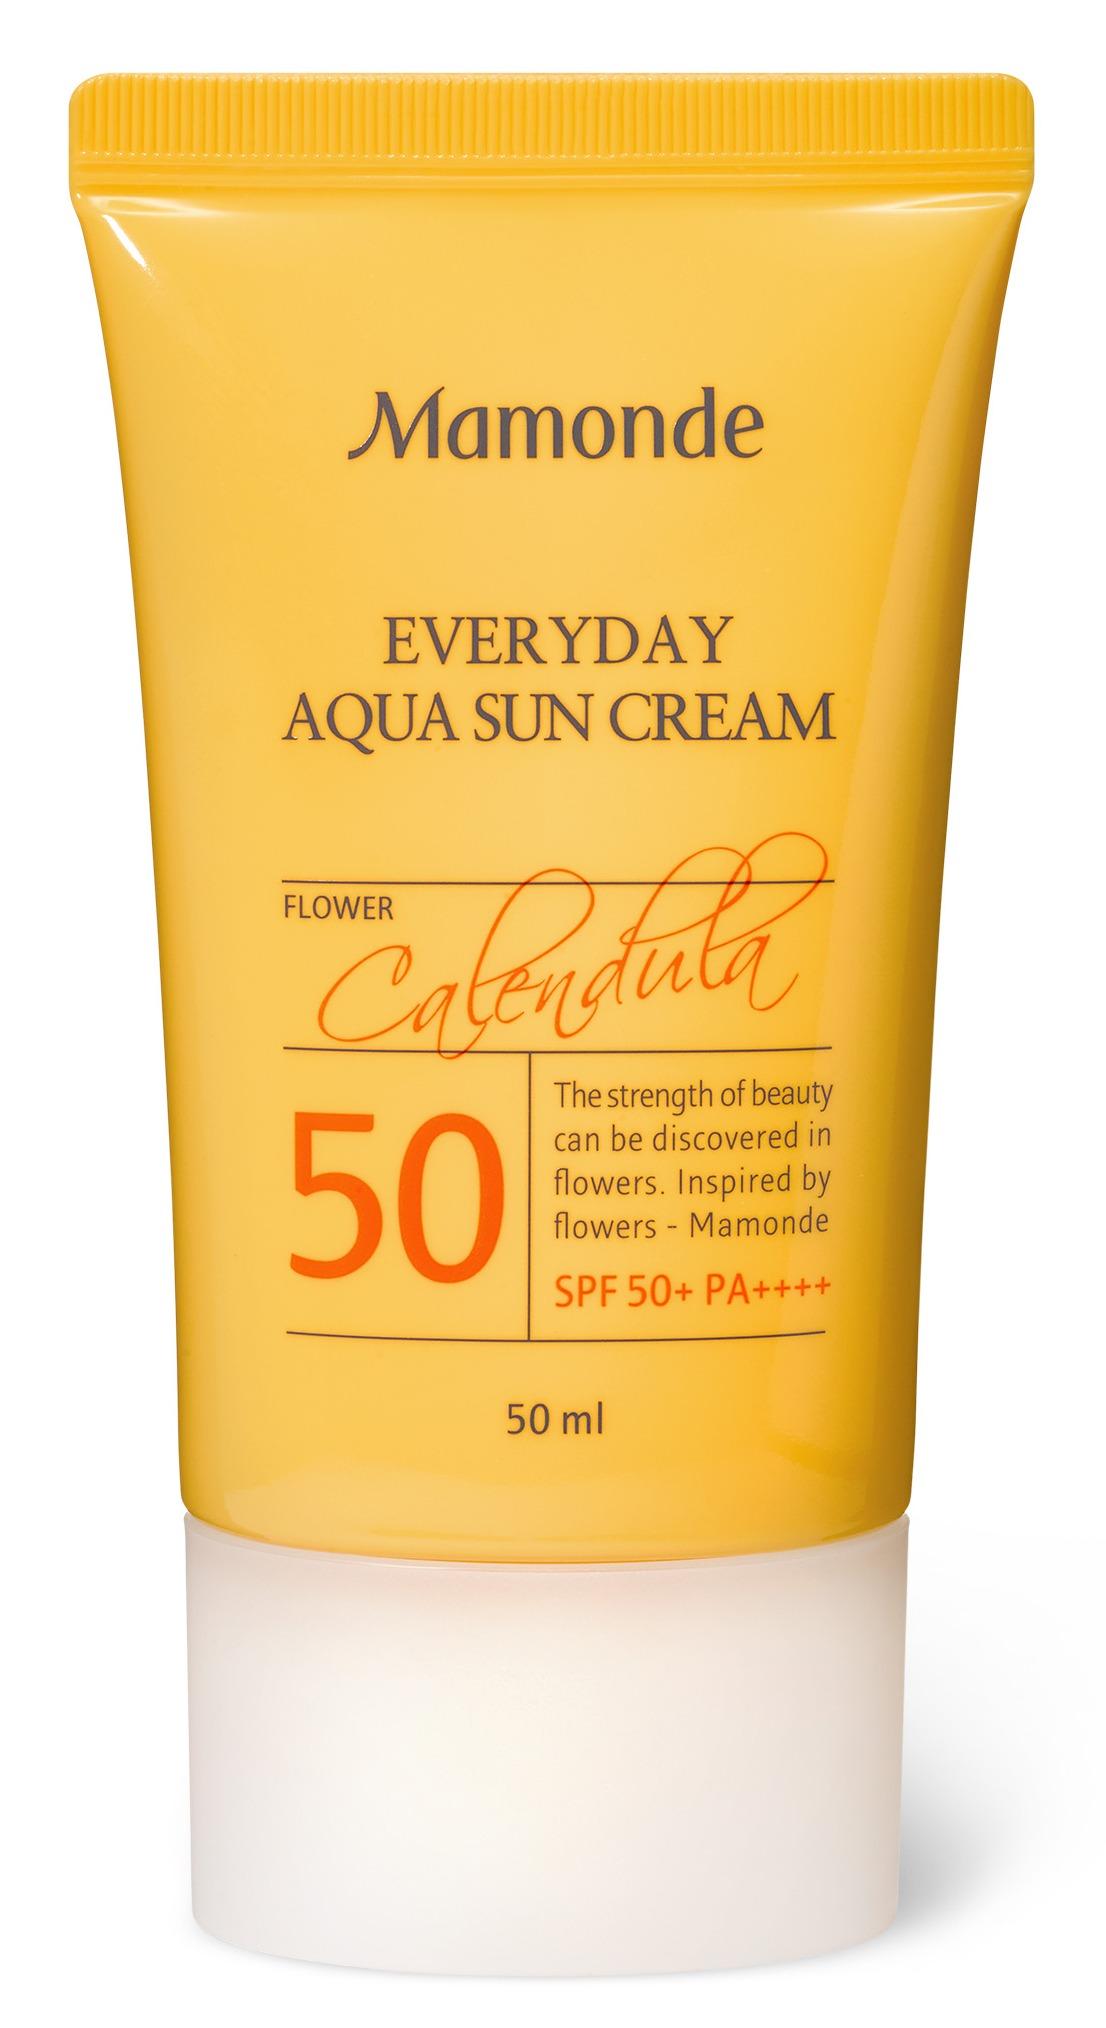 Mamonde Everyday Aqua Sun Cream SPF 50+